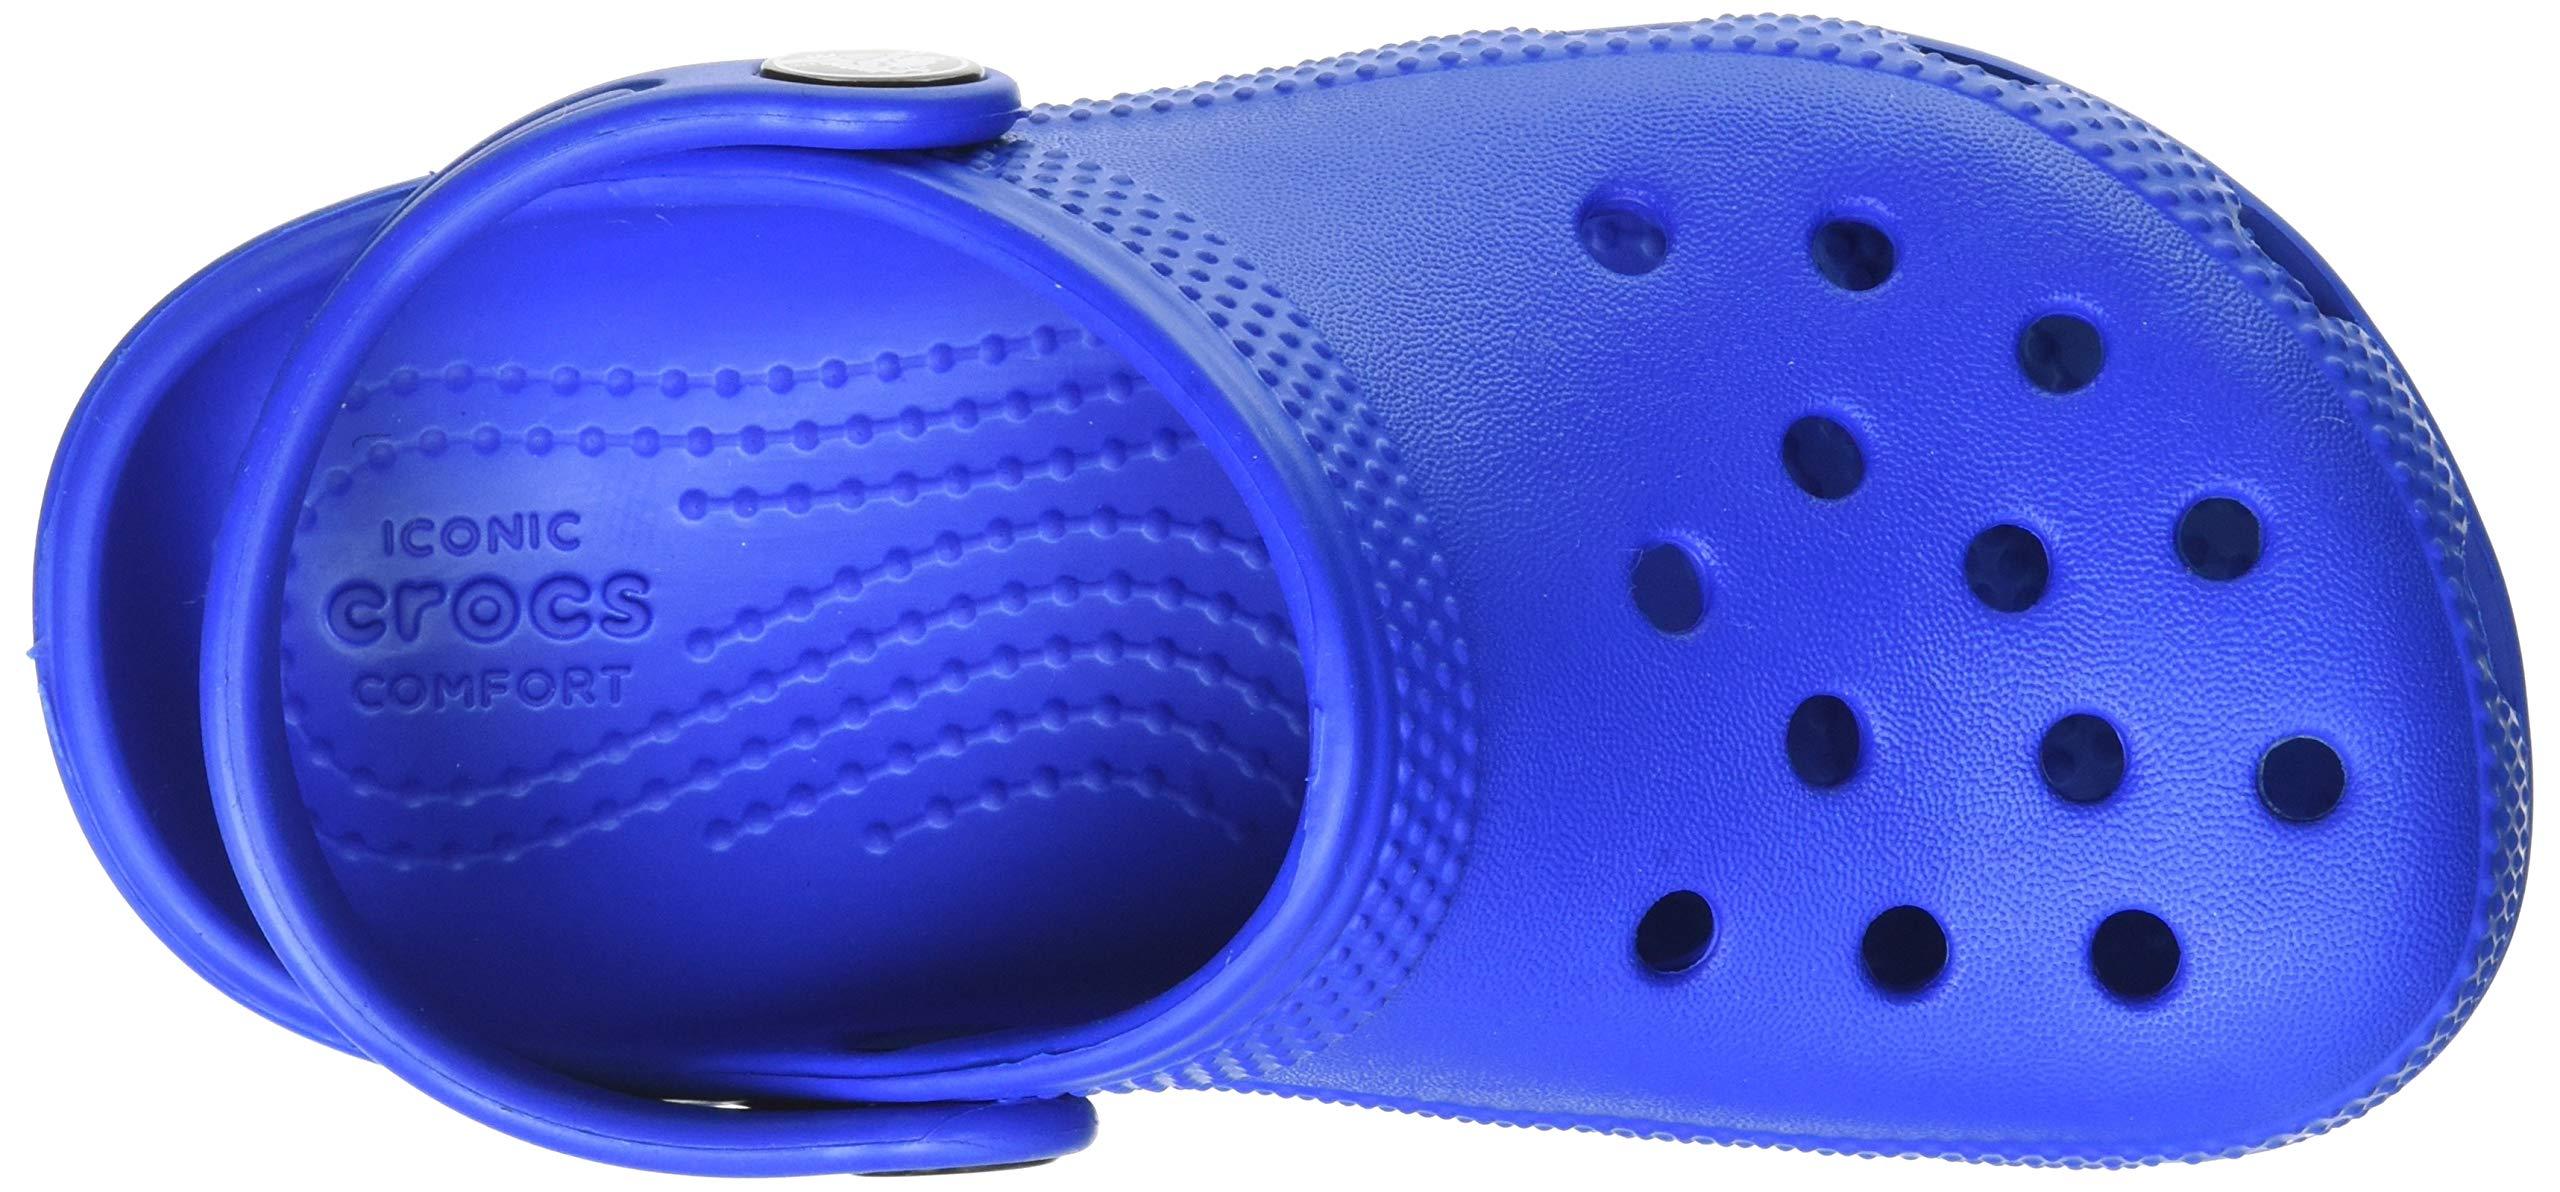 Crocs Classic Clog, Bright Cobalt, 13 M US Little Kid by Crocs (Image #7)